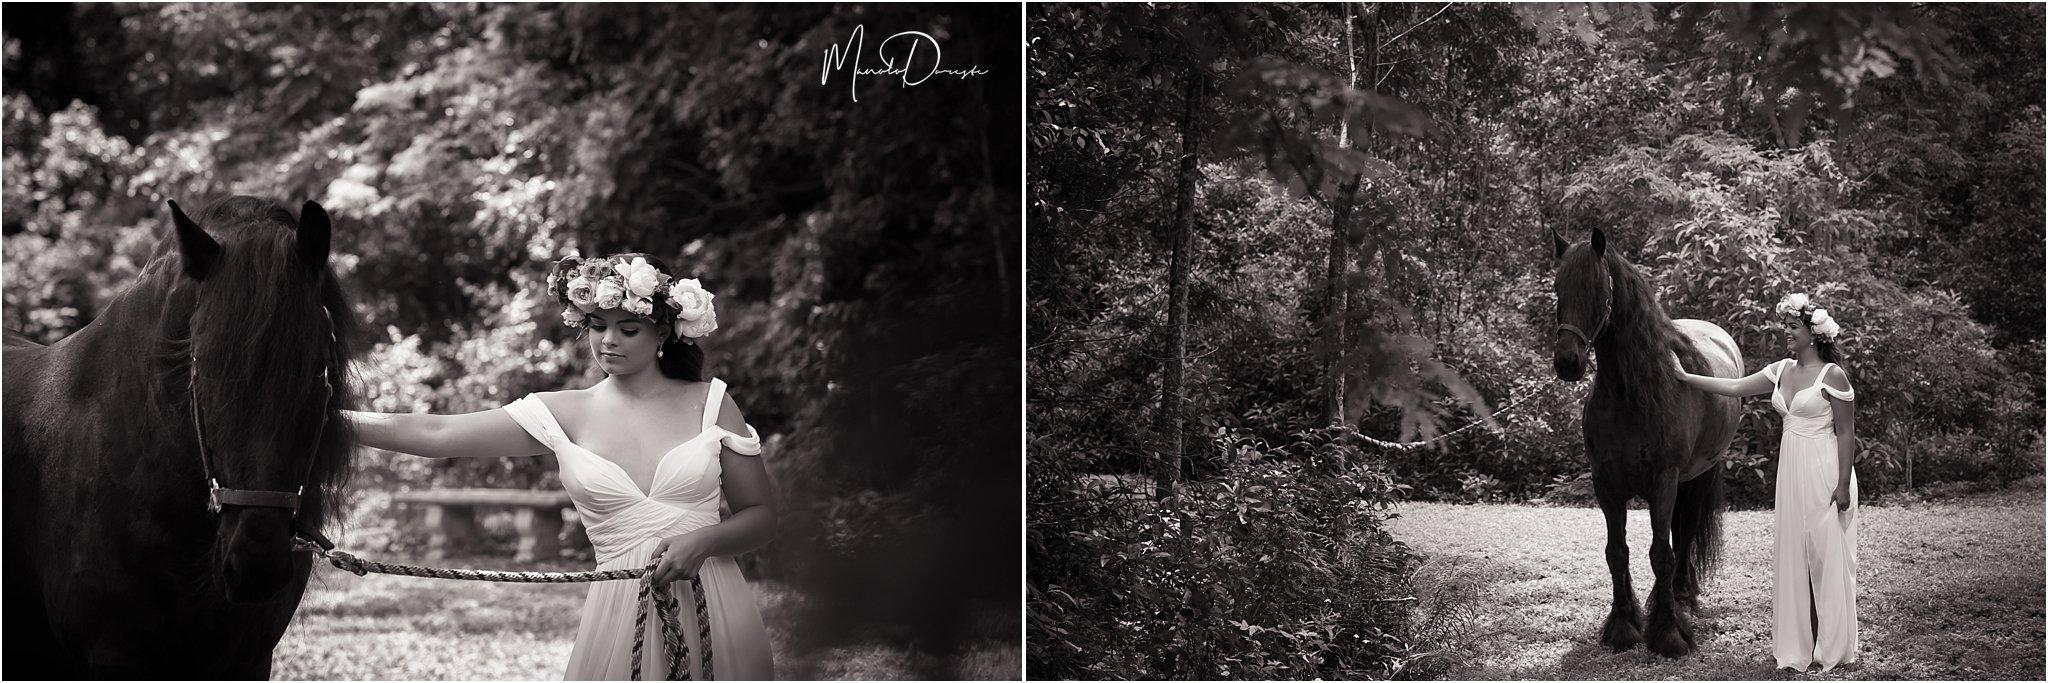 0339_ManoloDoreste_InFocusStudios_Wedding_Family_Photography_Miami_MiamiPhotographer.jpg